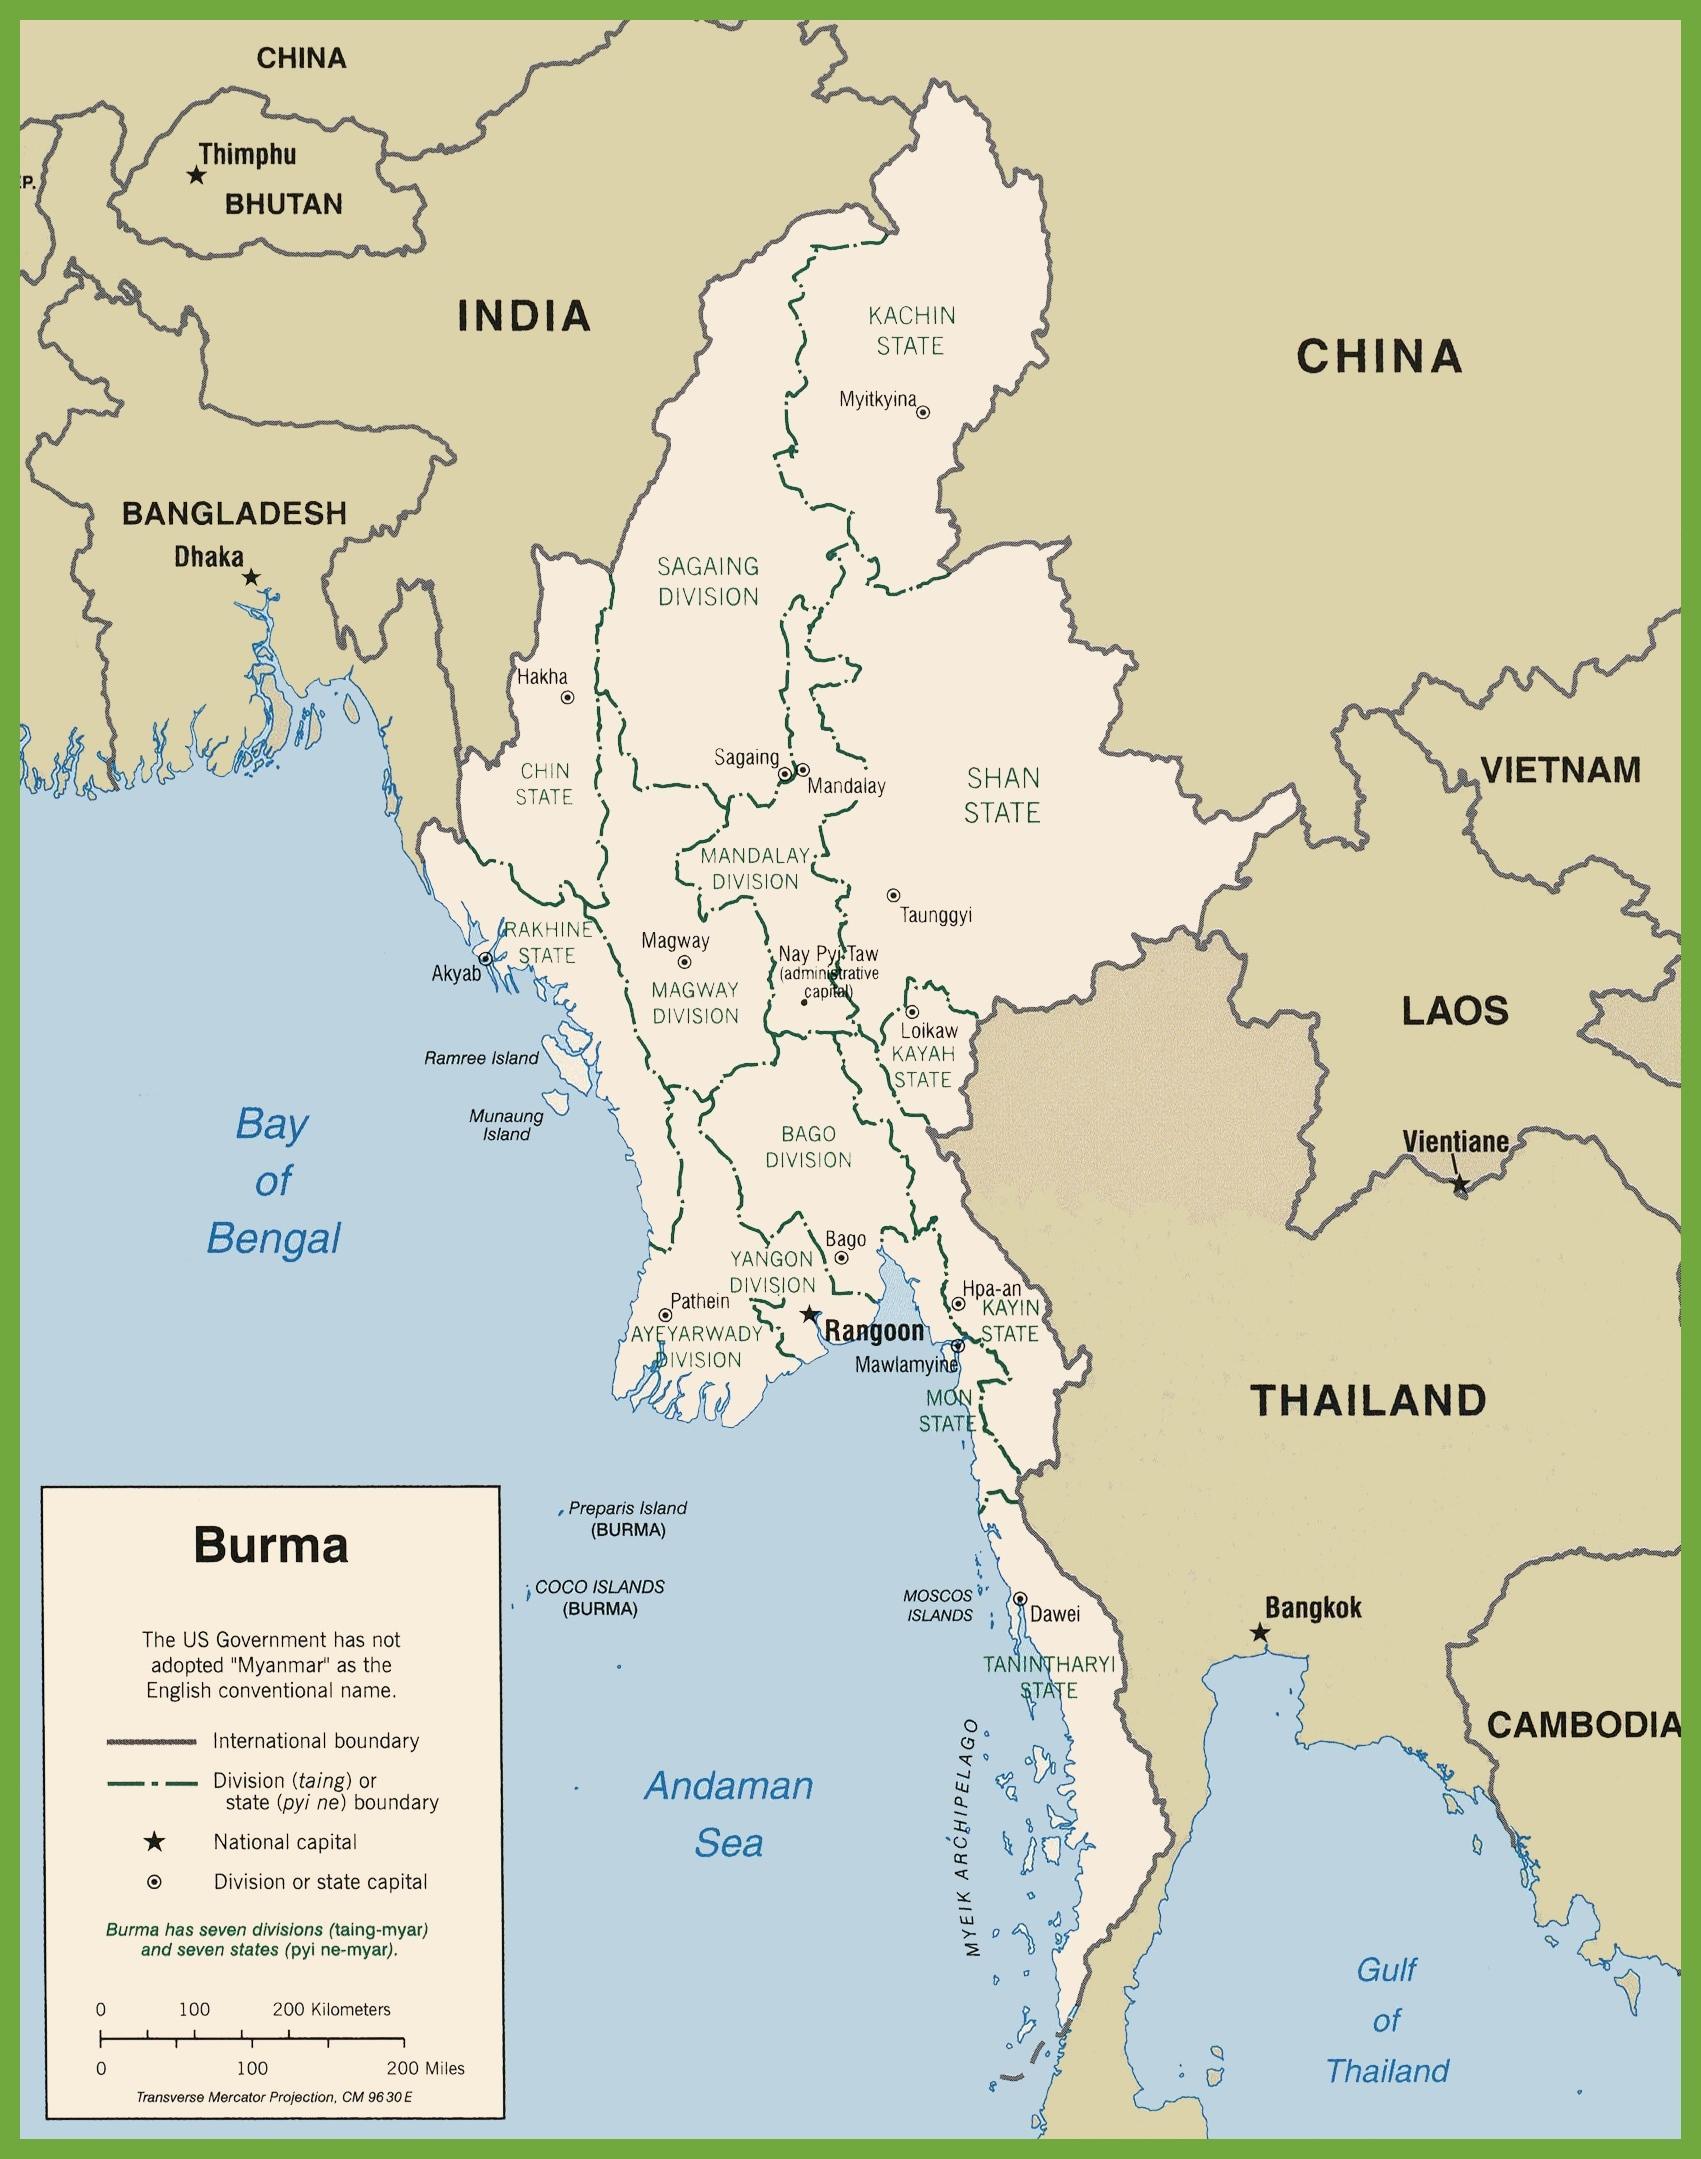 Carte Politique Birmanie.Myanmar Carte Politique Birmanie Carte Politique Asie Du